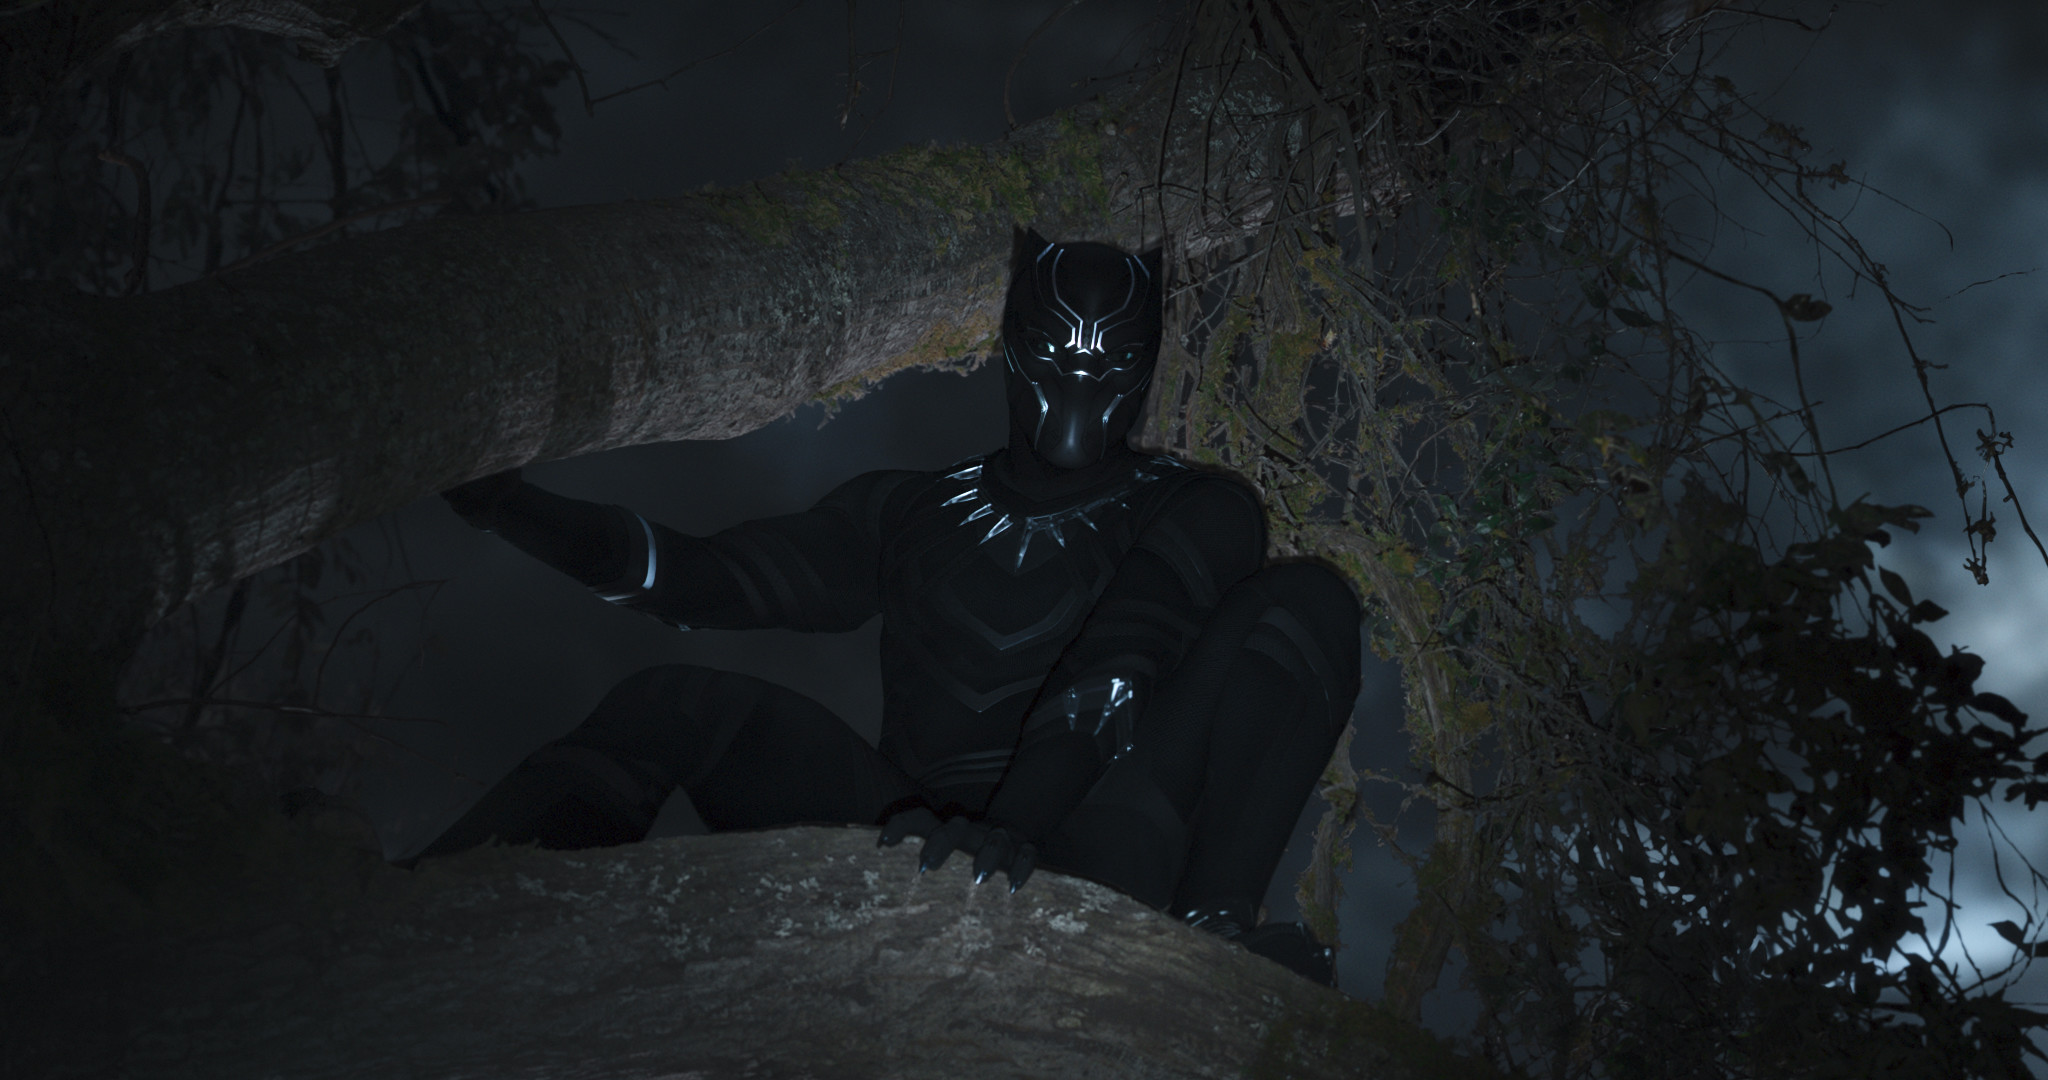 Res: 2048x1080, Black Panther/T'Challa (Chadwick Boseman